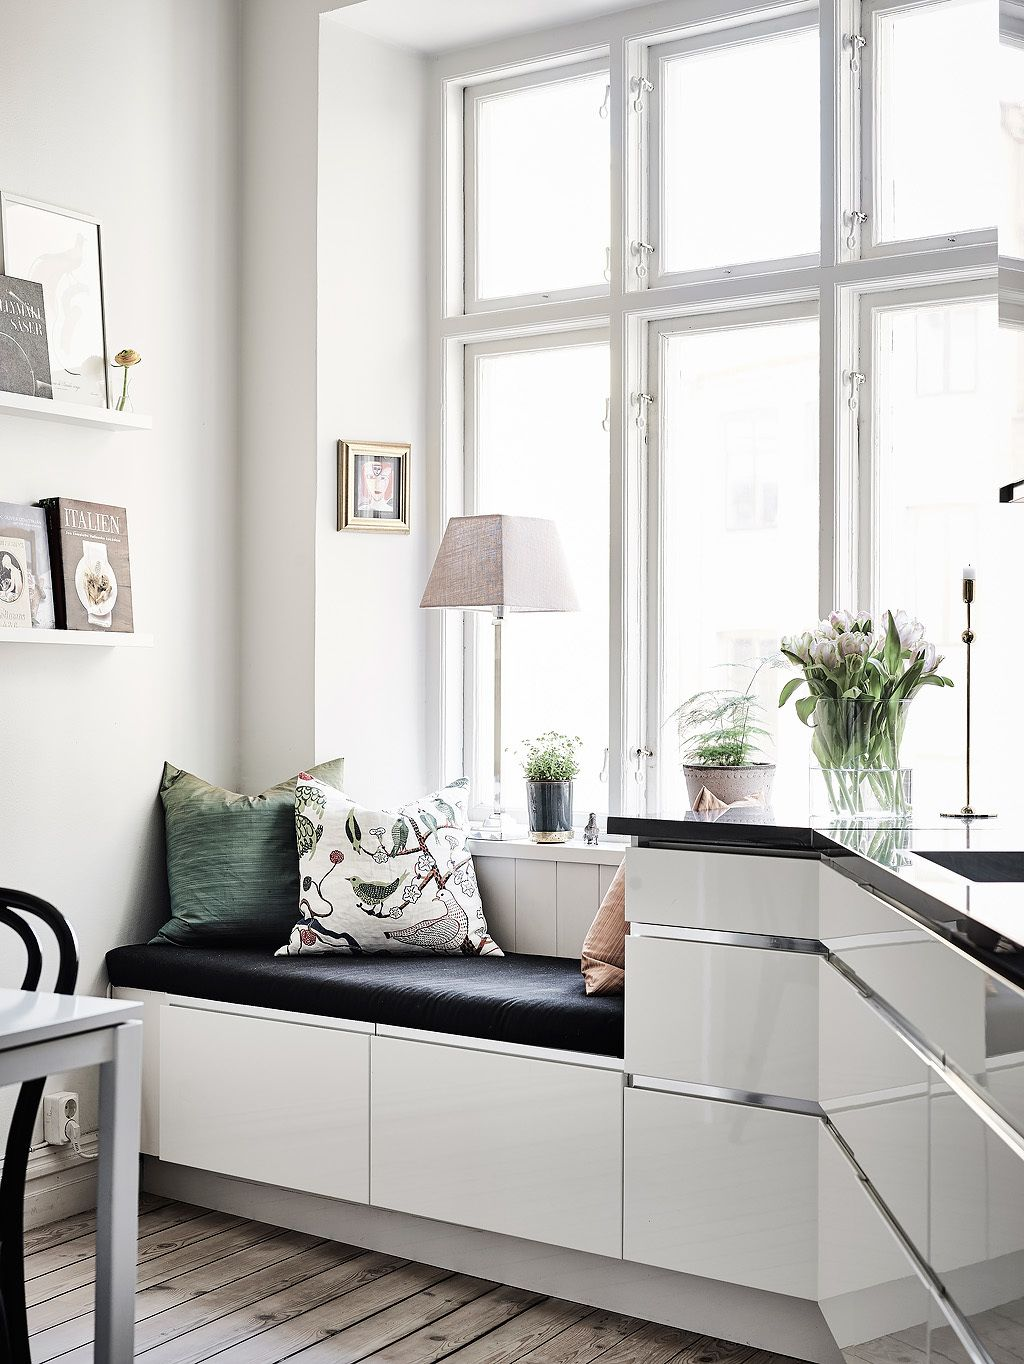 Window seat | Accommodation | Pinterest | Scandinavian interior ...